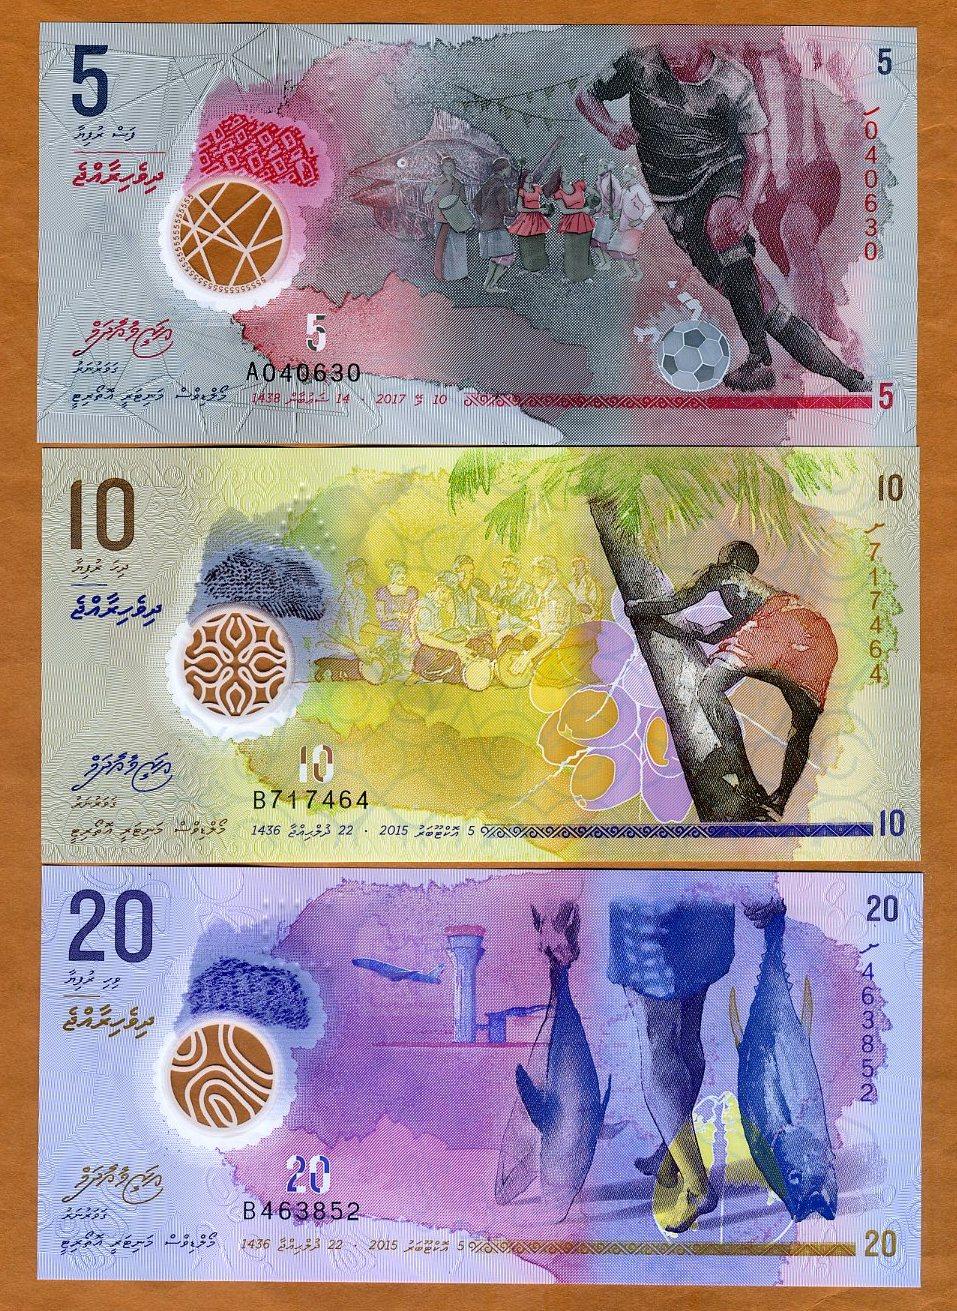 2016 POLYMER P 30 REPLACEMENT Z PREFIX UNC MALDIVES 500 RUFIYAA 2015